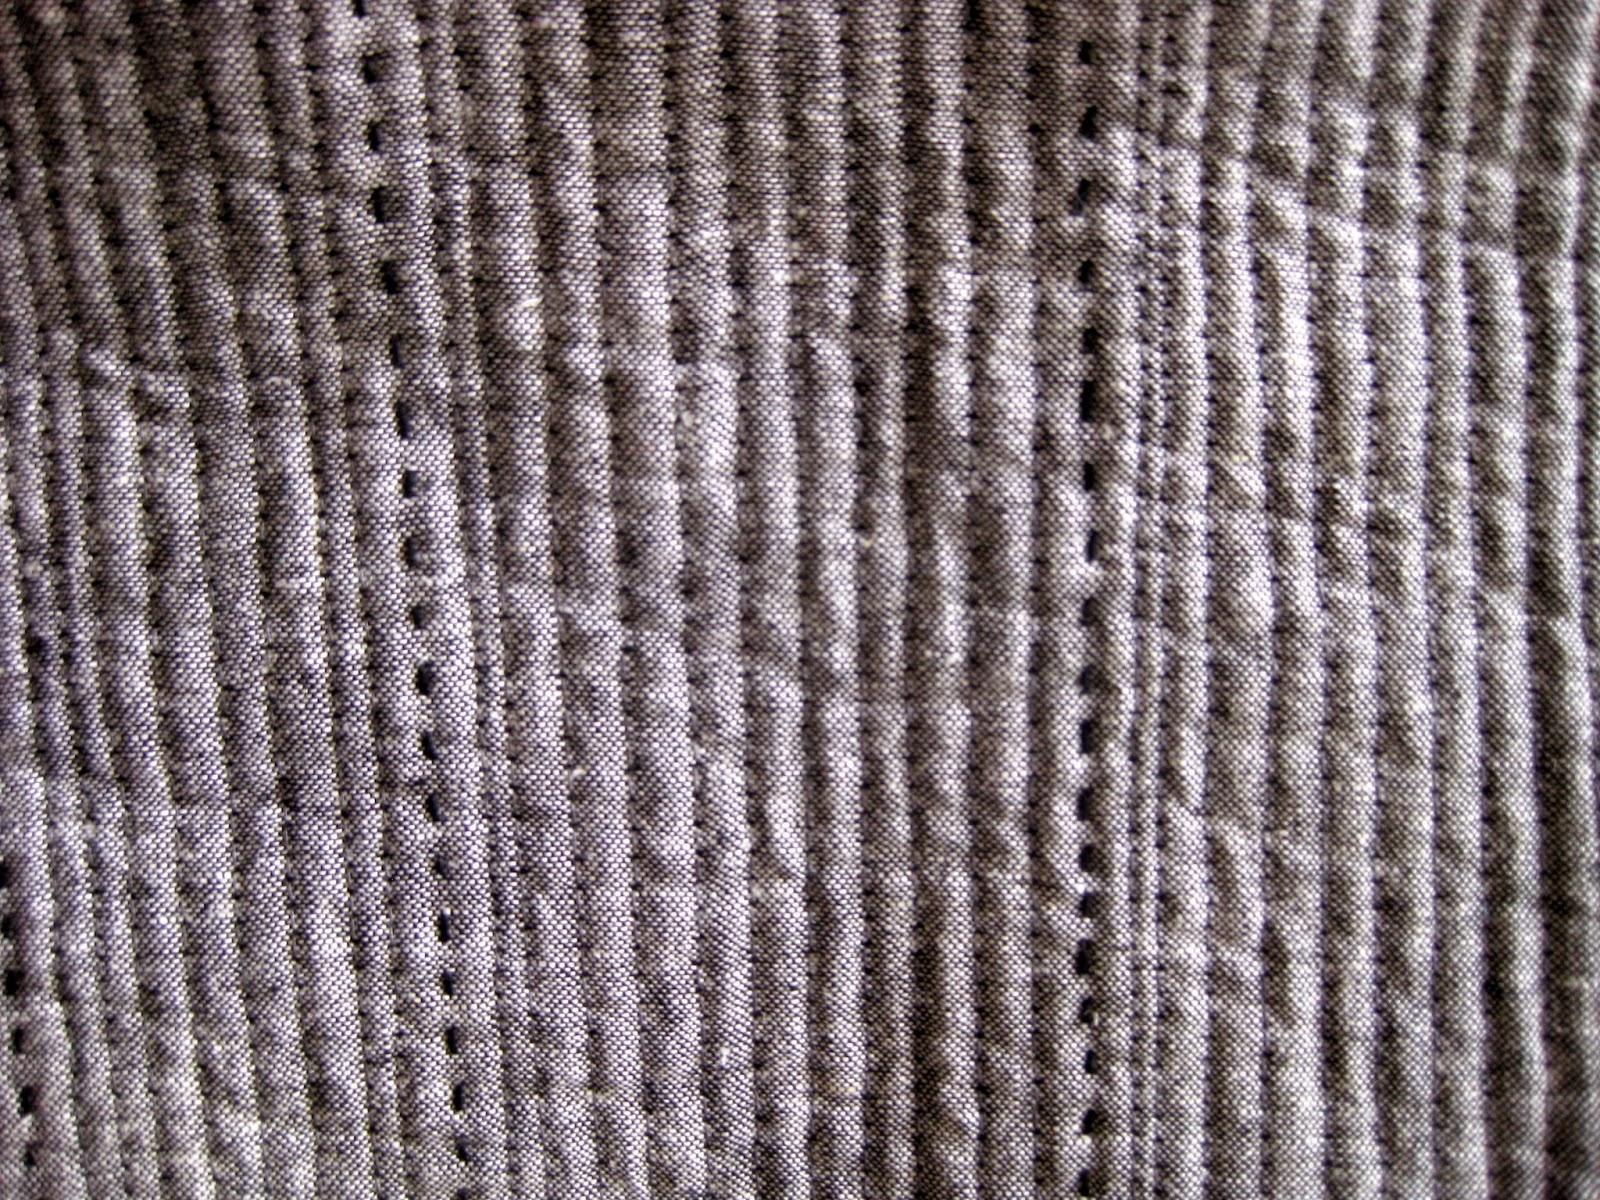 big stitch mixed with machine stitched